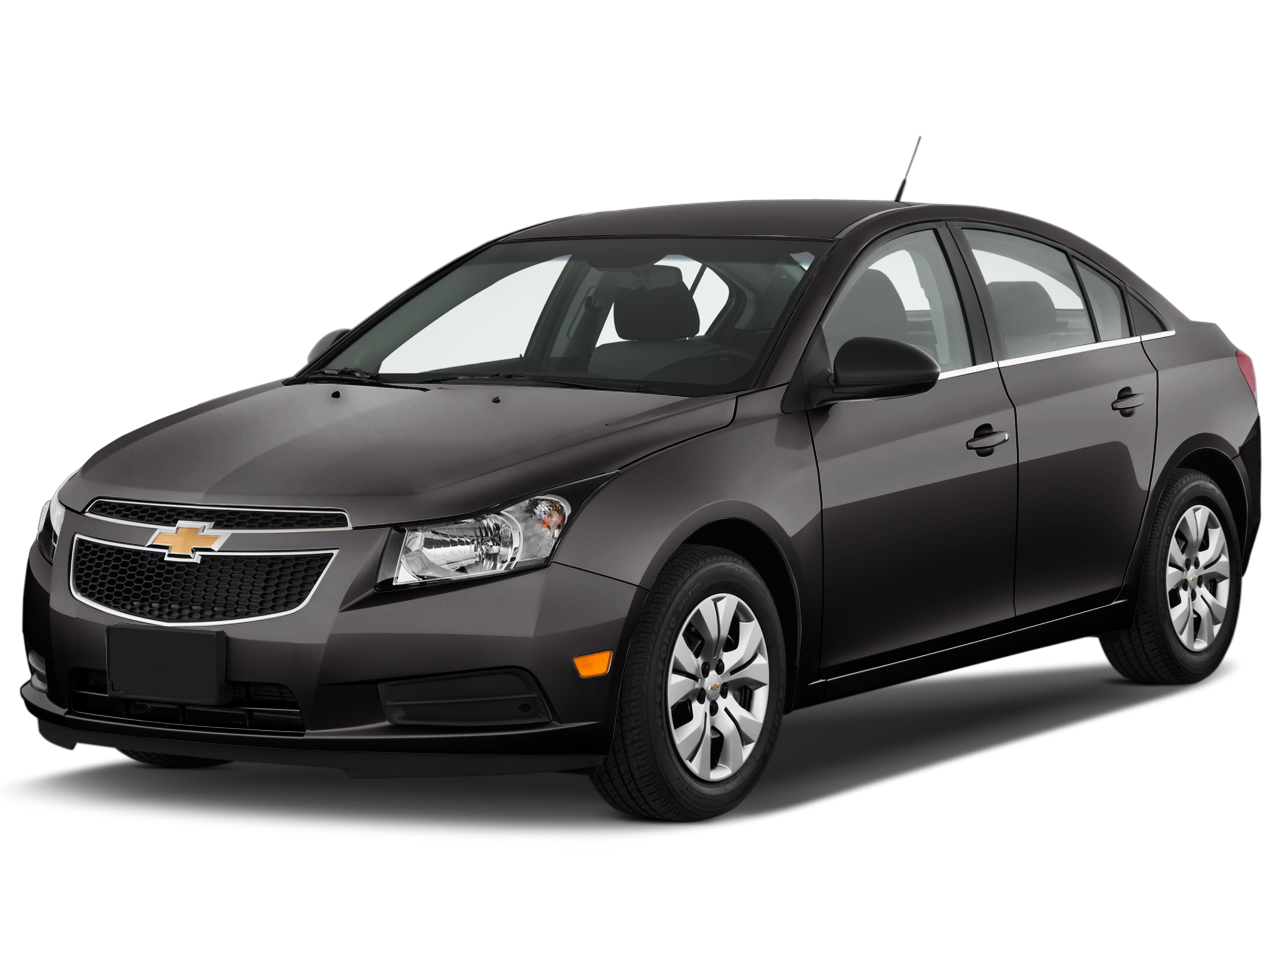 Used One Owner 2014 Chevrolet Cruze Ls Near Shawnee Ok Joe Cooper Chevrolet Cadillac